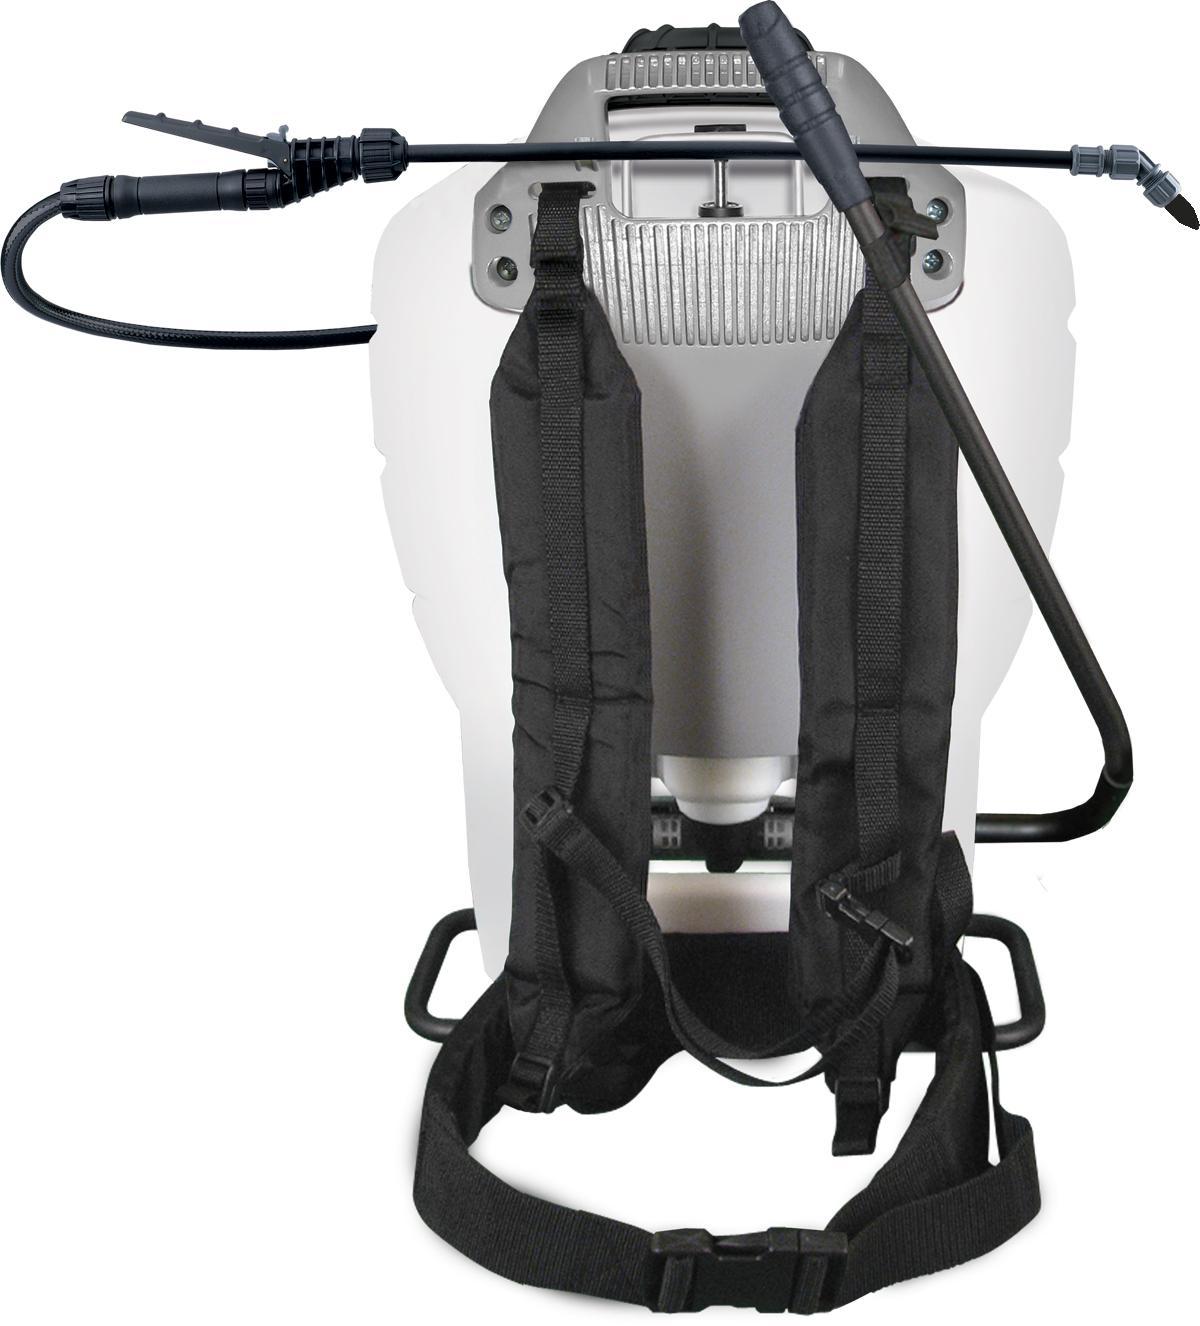 Amazon.com : Roundup 190327 No Leak Pump Backpack Sprayer